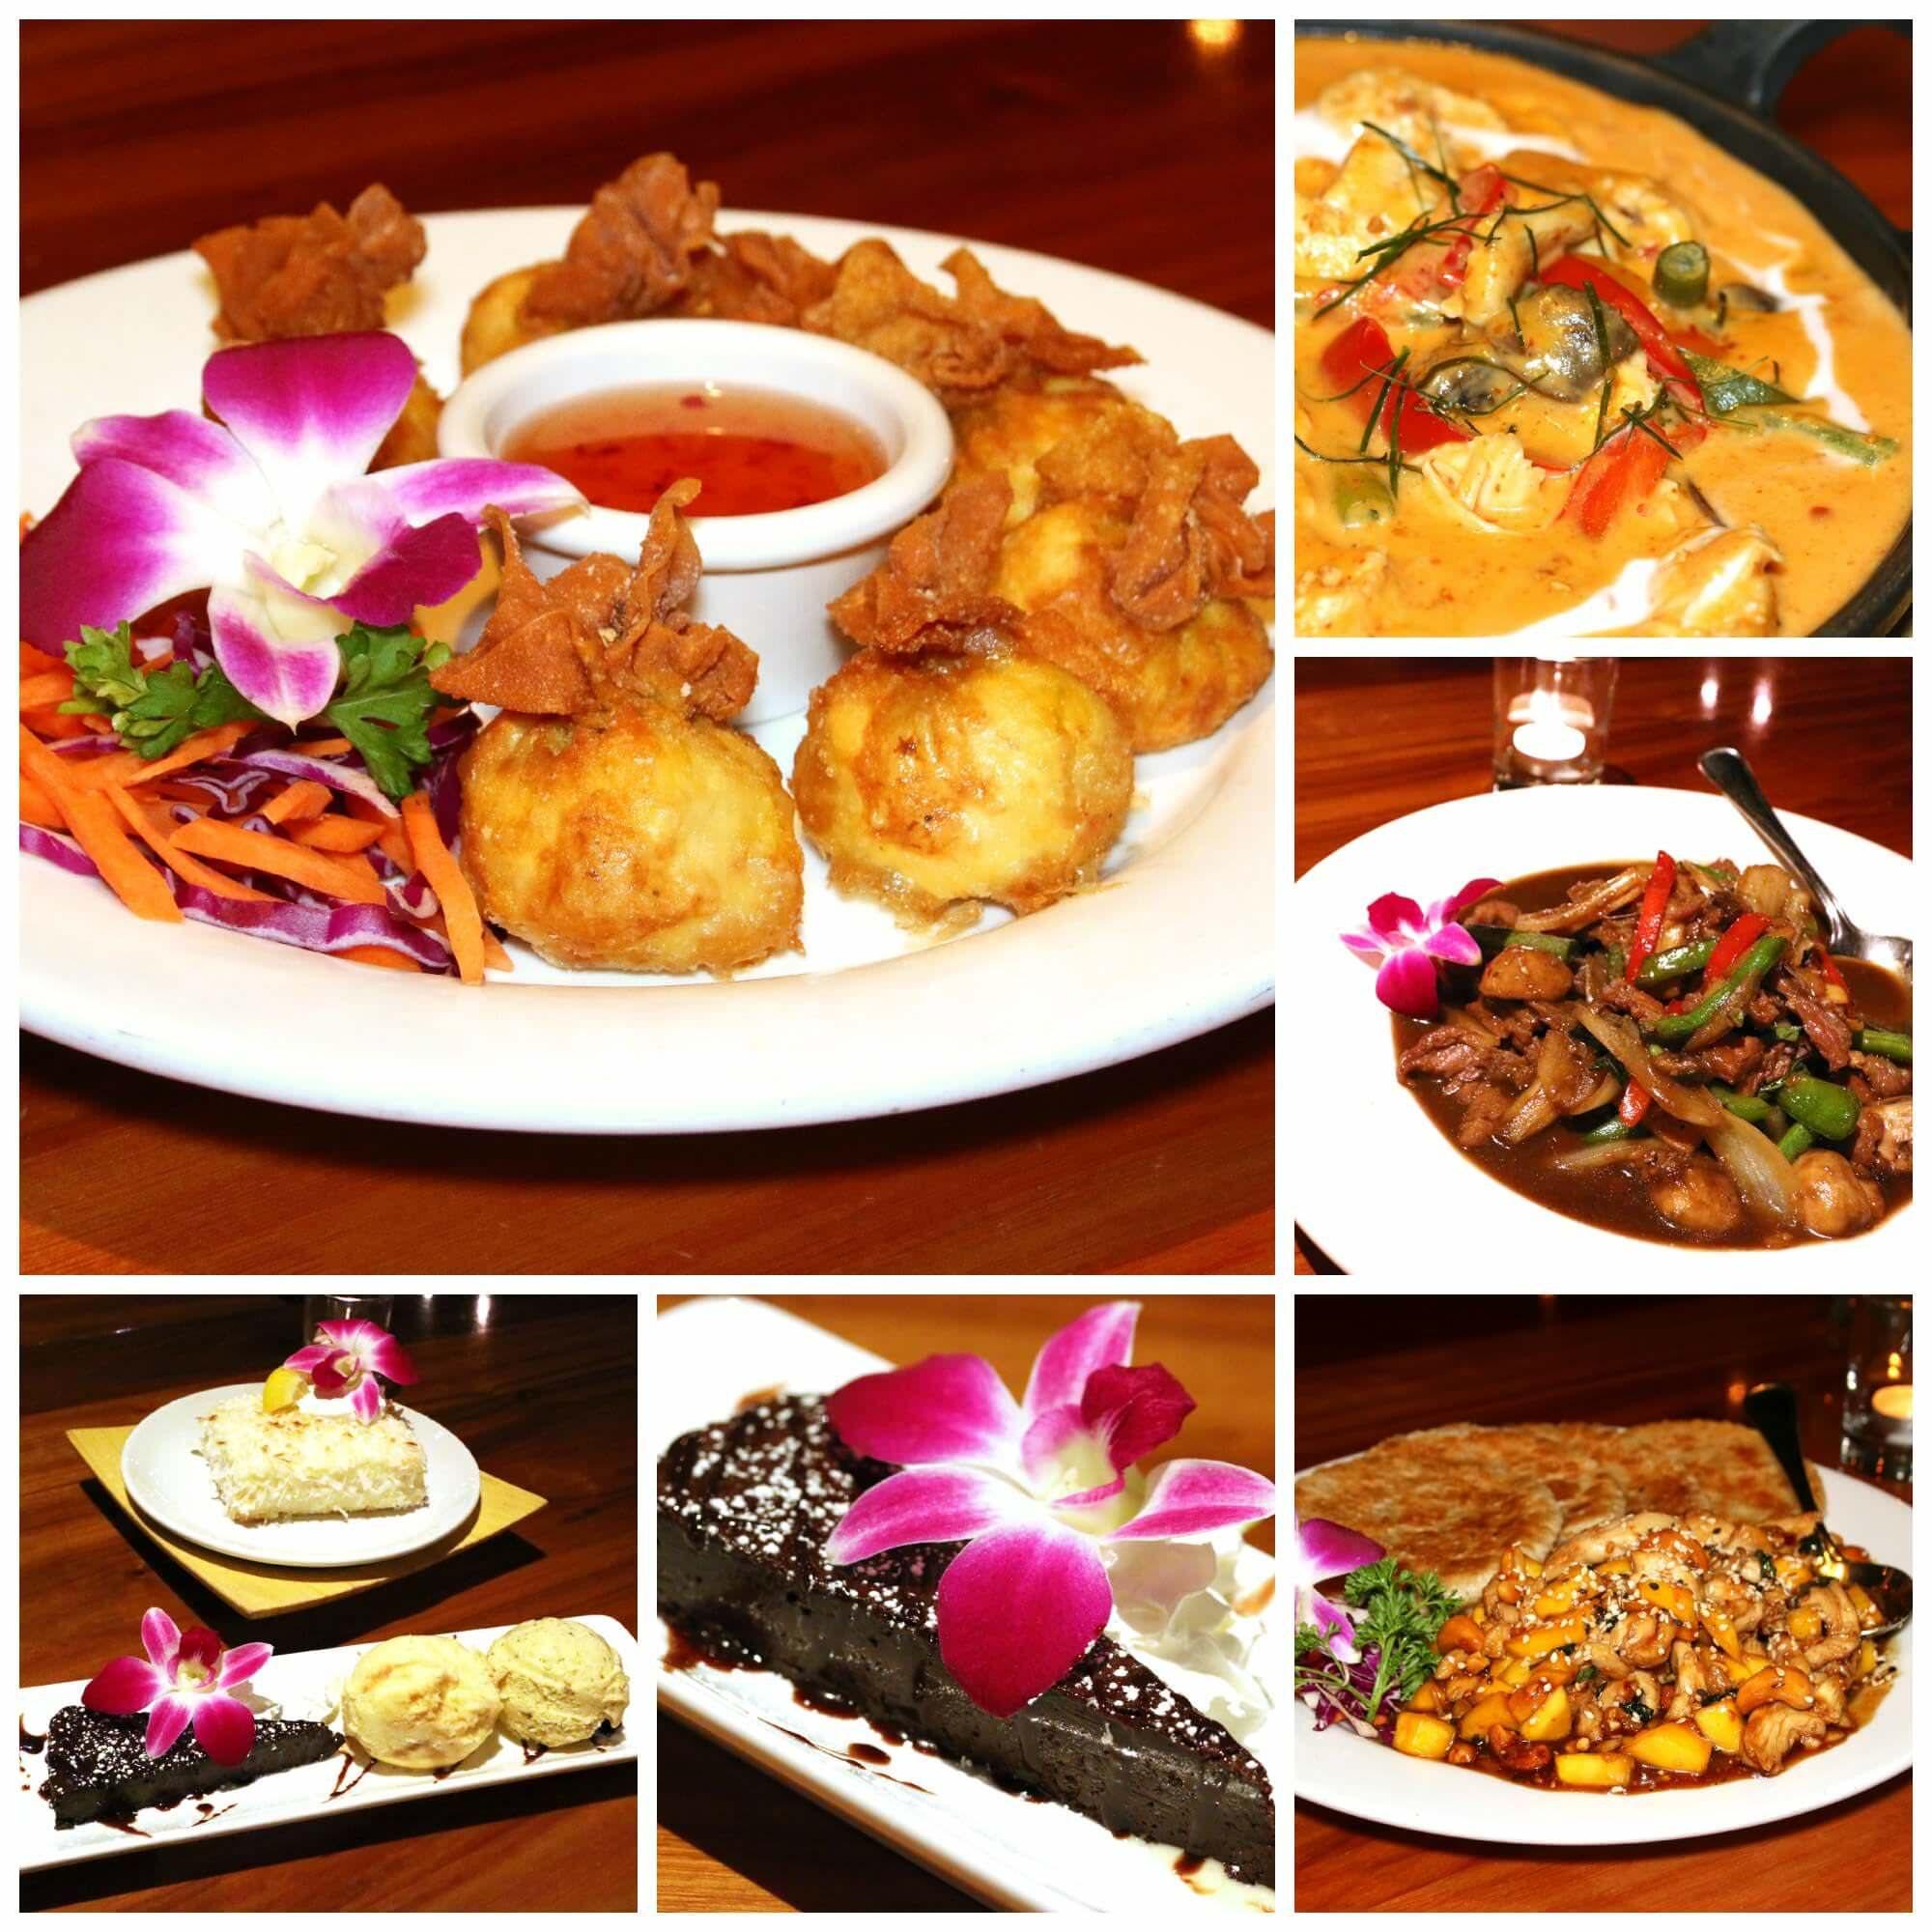 Myhometownguide 5 fabulous eats eat asian